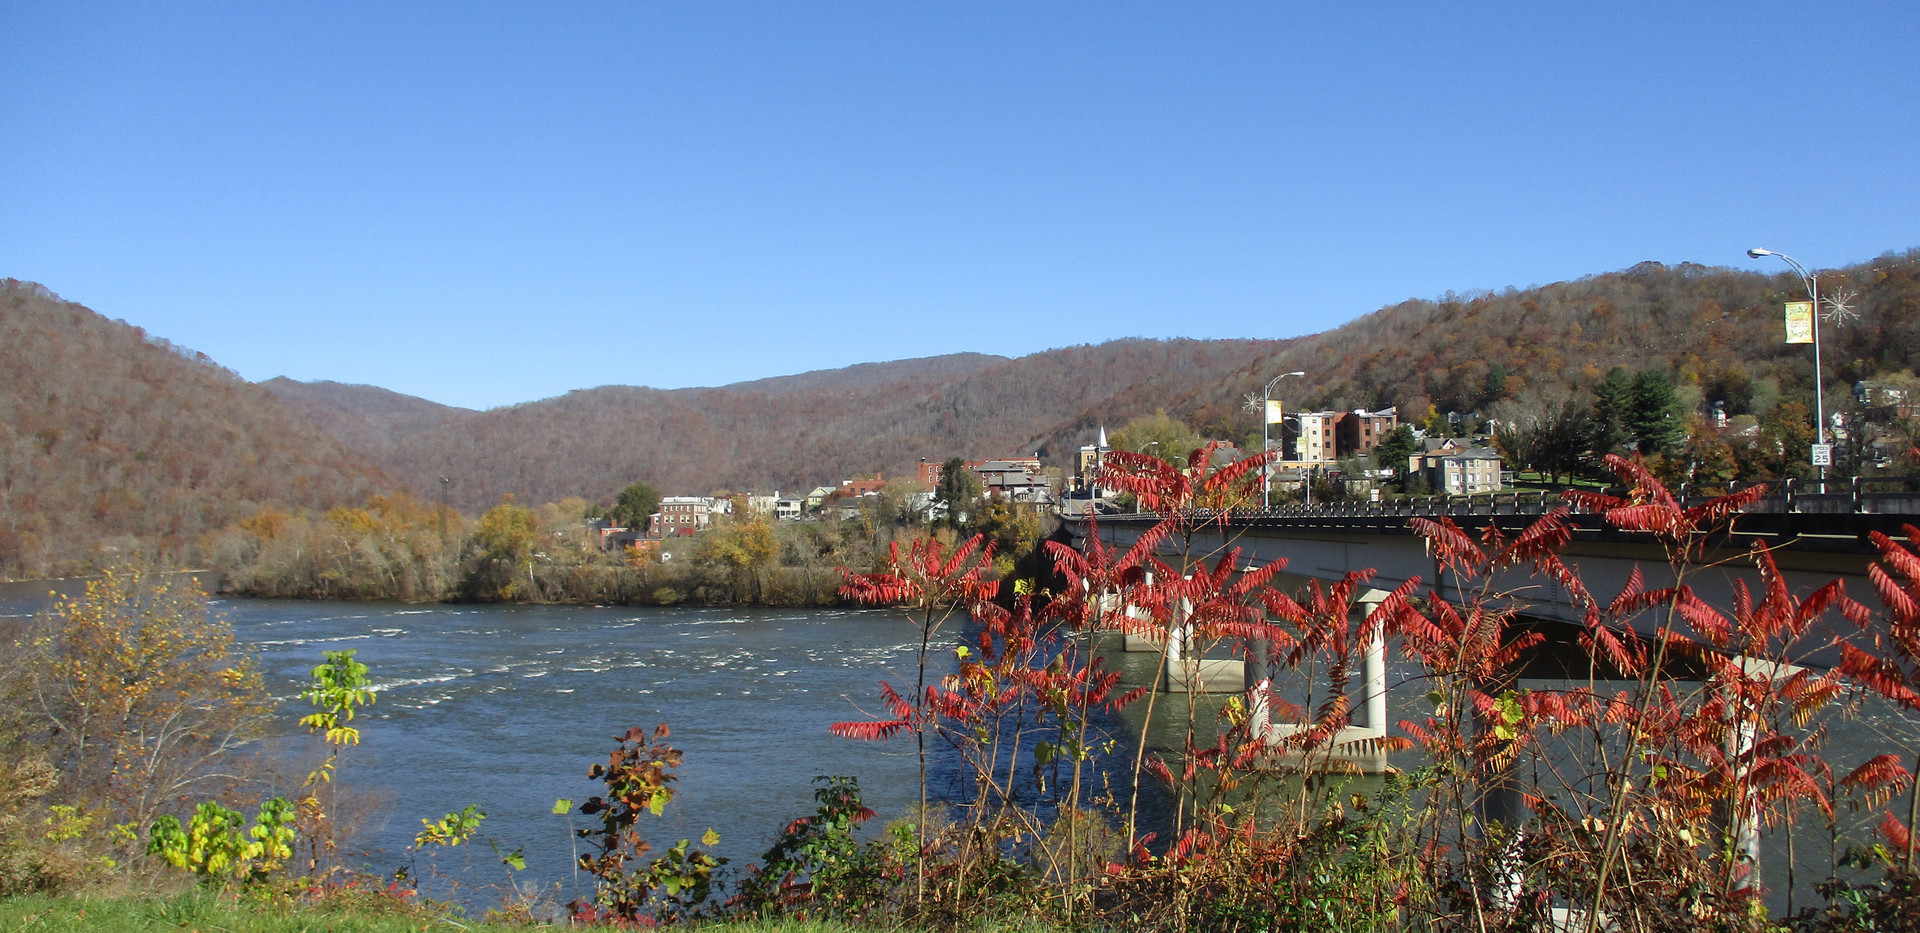 Historic Hinton across New River